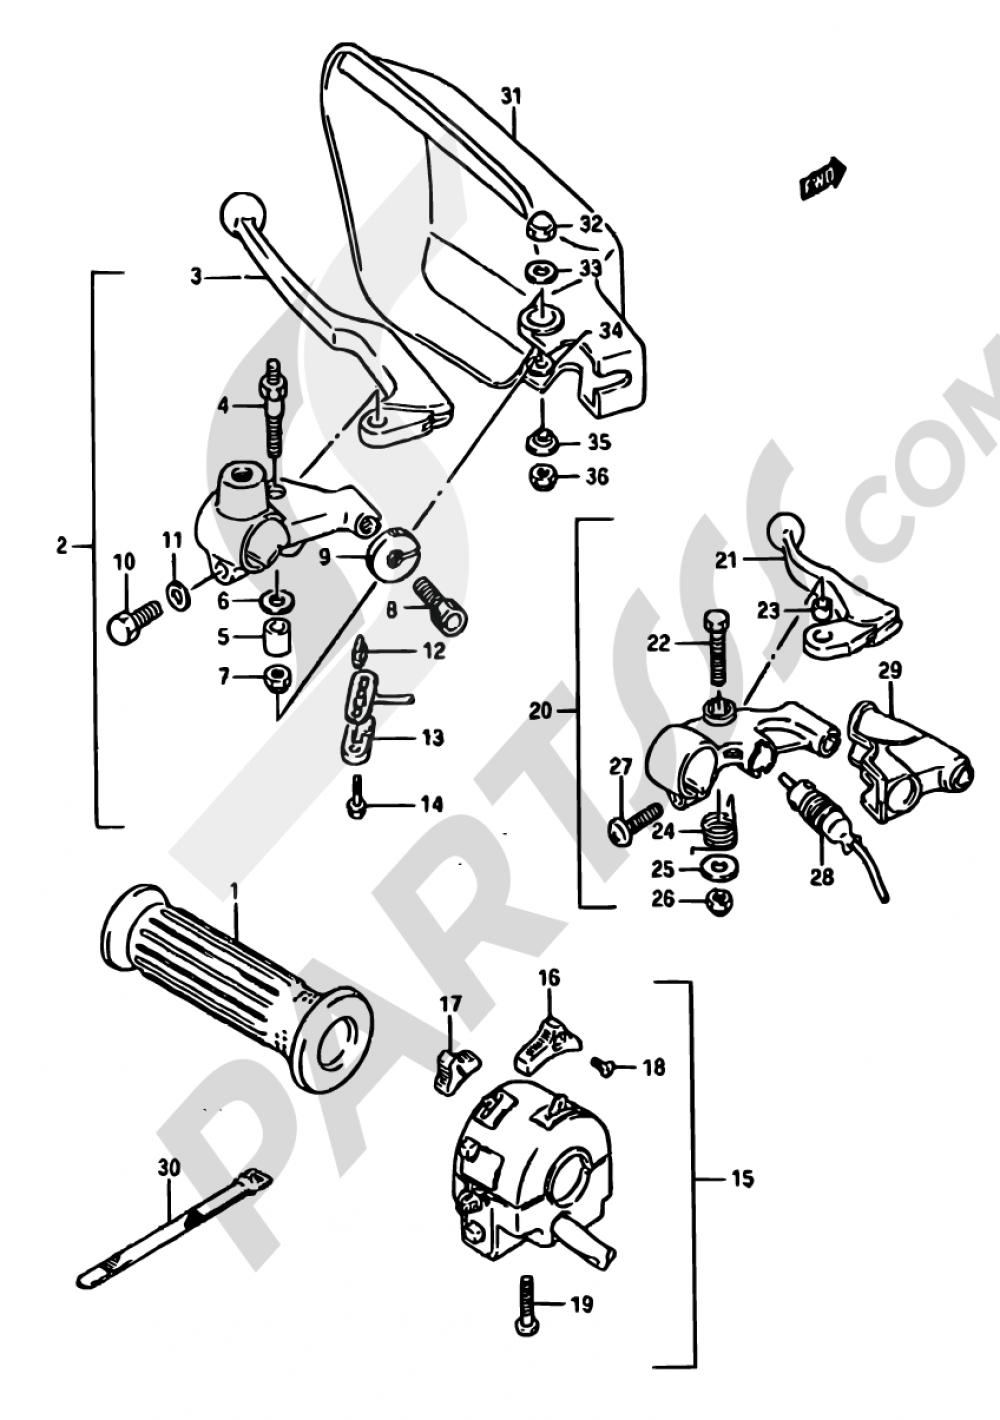 42 - LEFT HANDLE SWITCH (MODEL J) Suzuki DR750S 1988